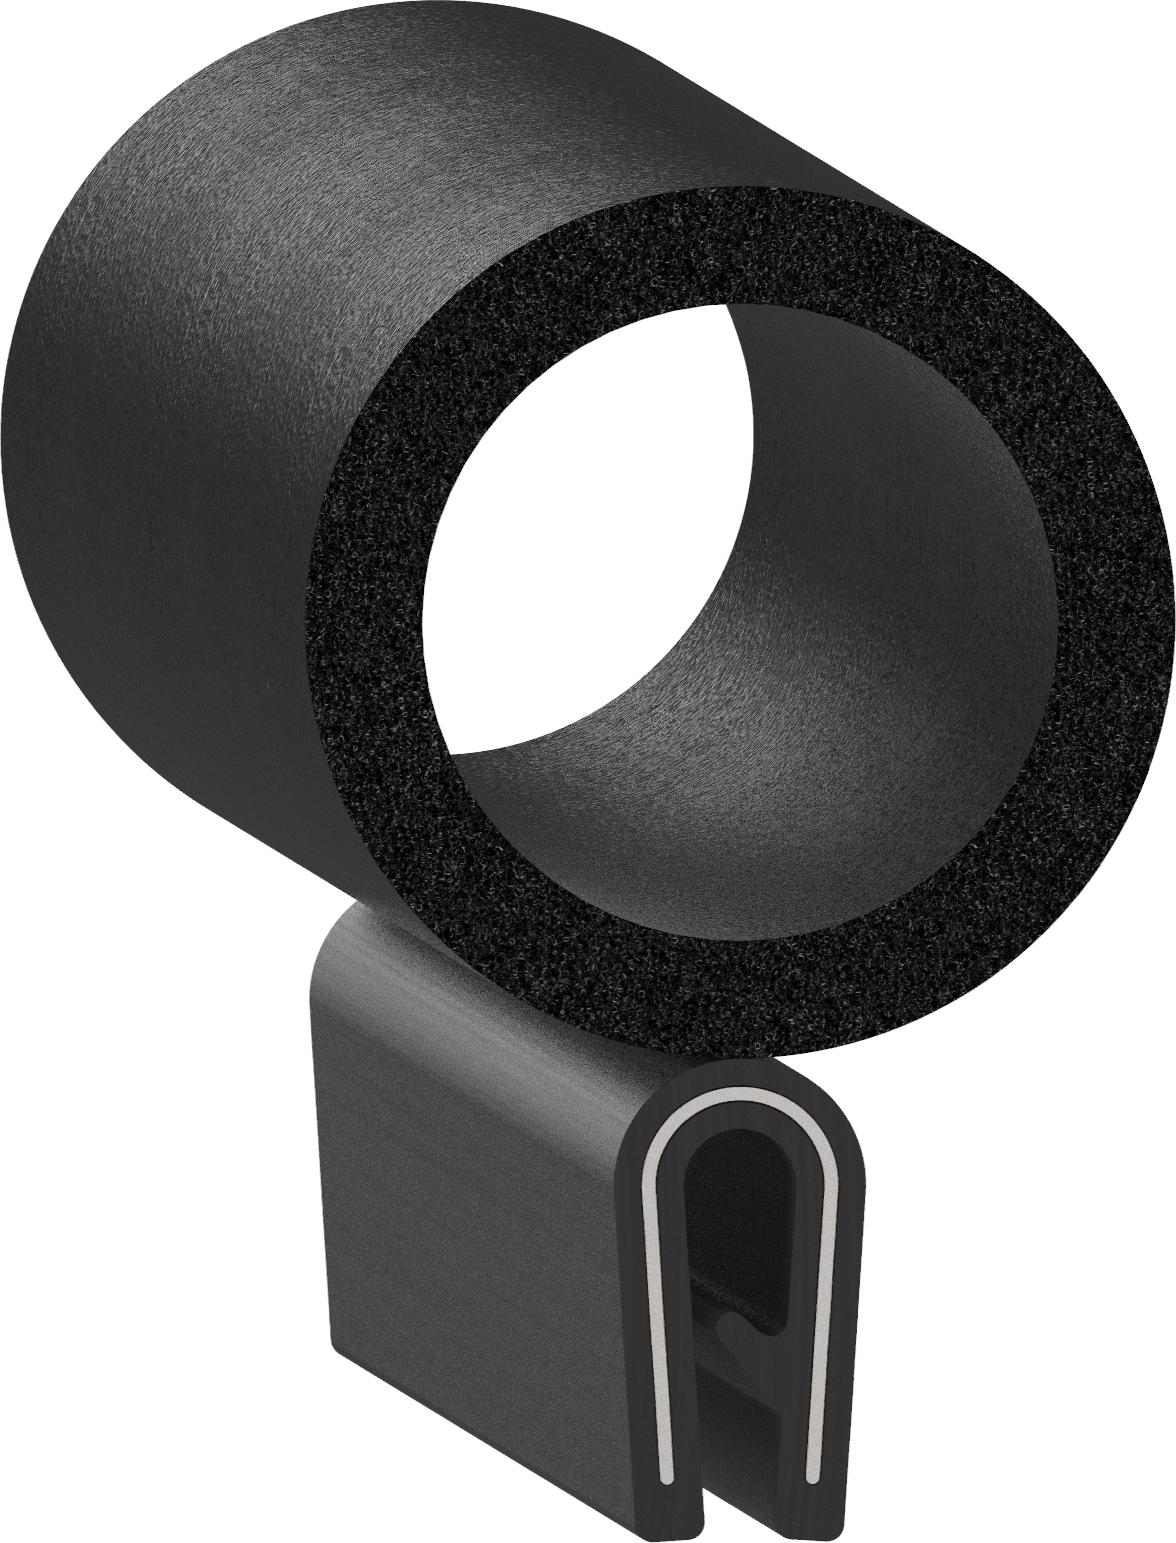 Uni-Grip part: SD-1205 T w/ 1in Bulb